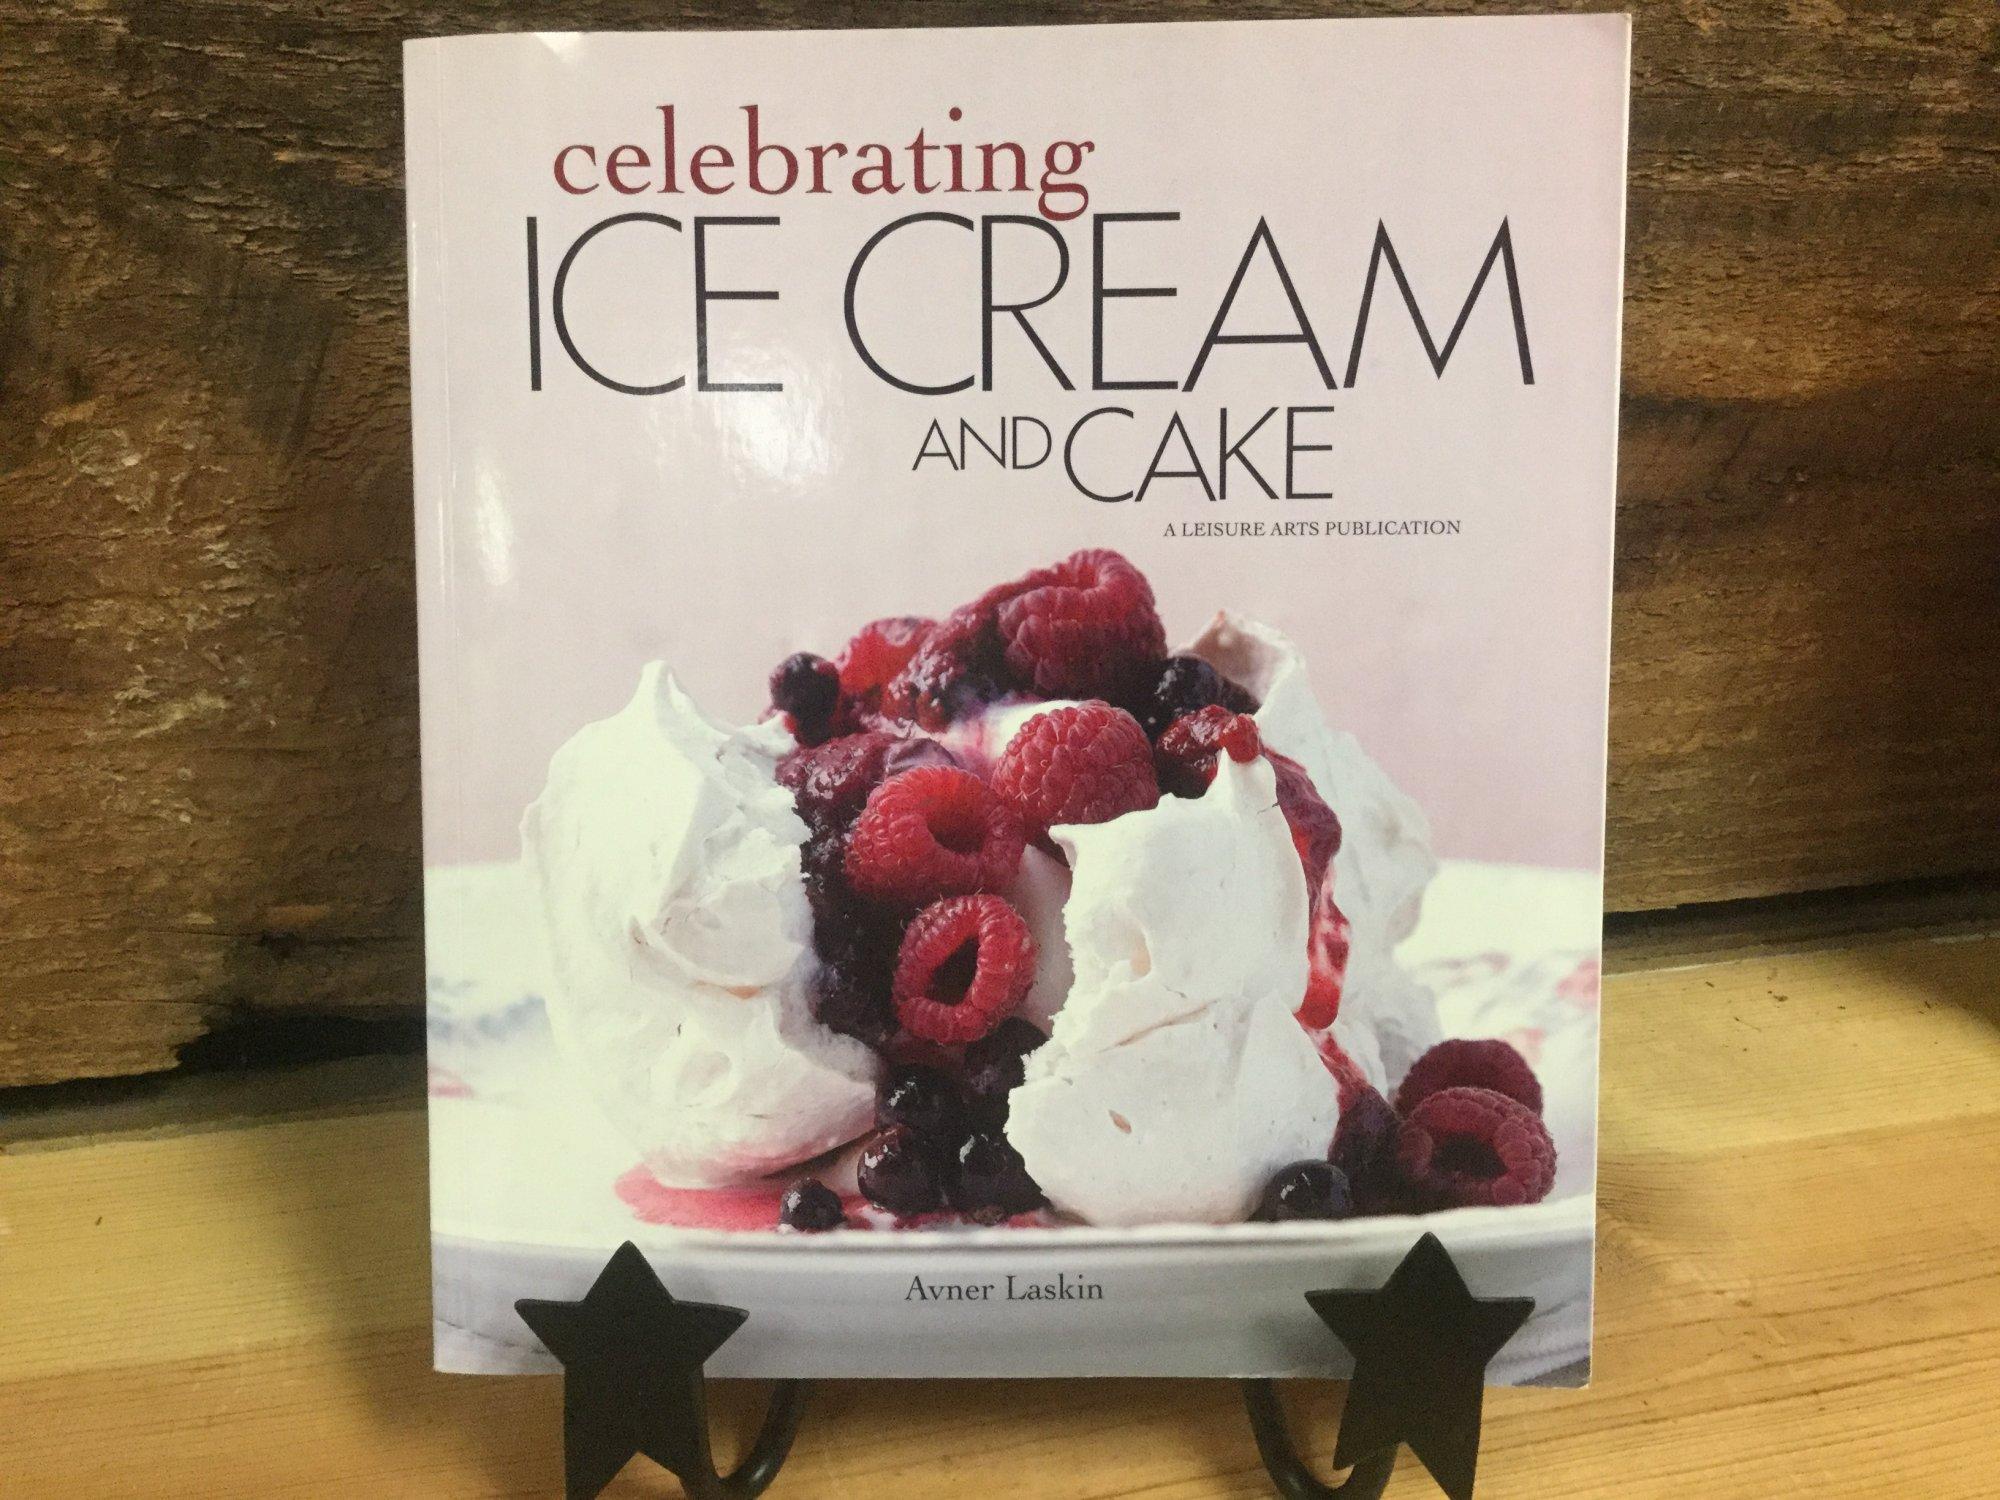 Celebrating Ice Cream and Cake